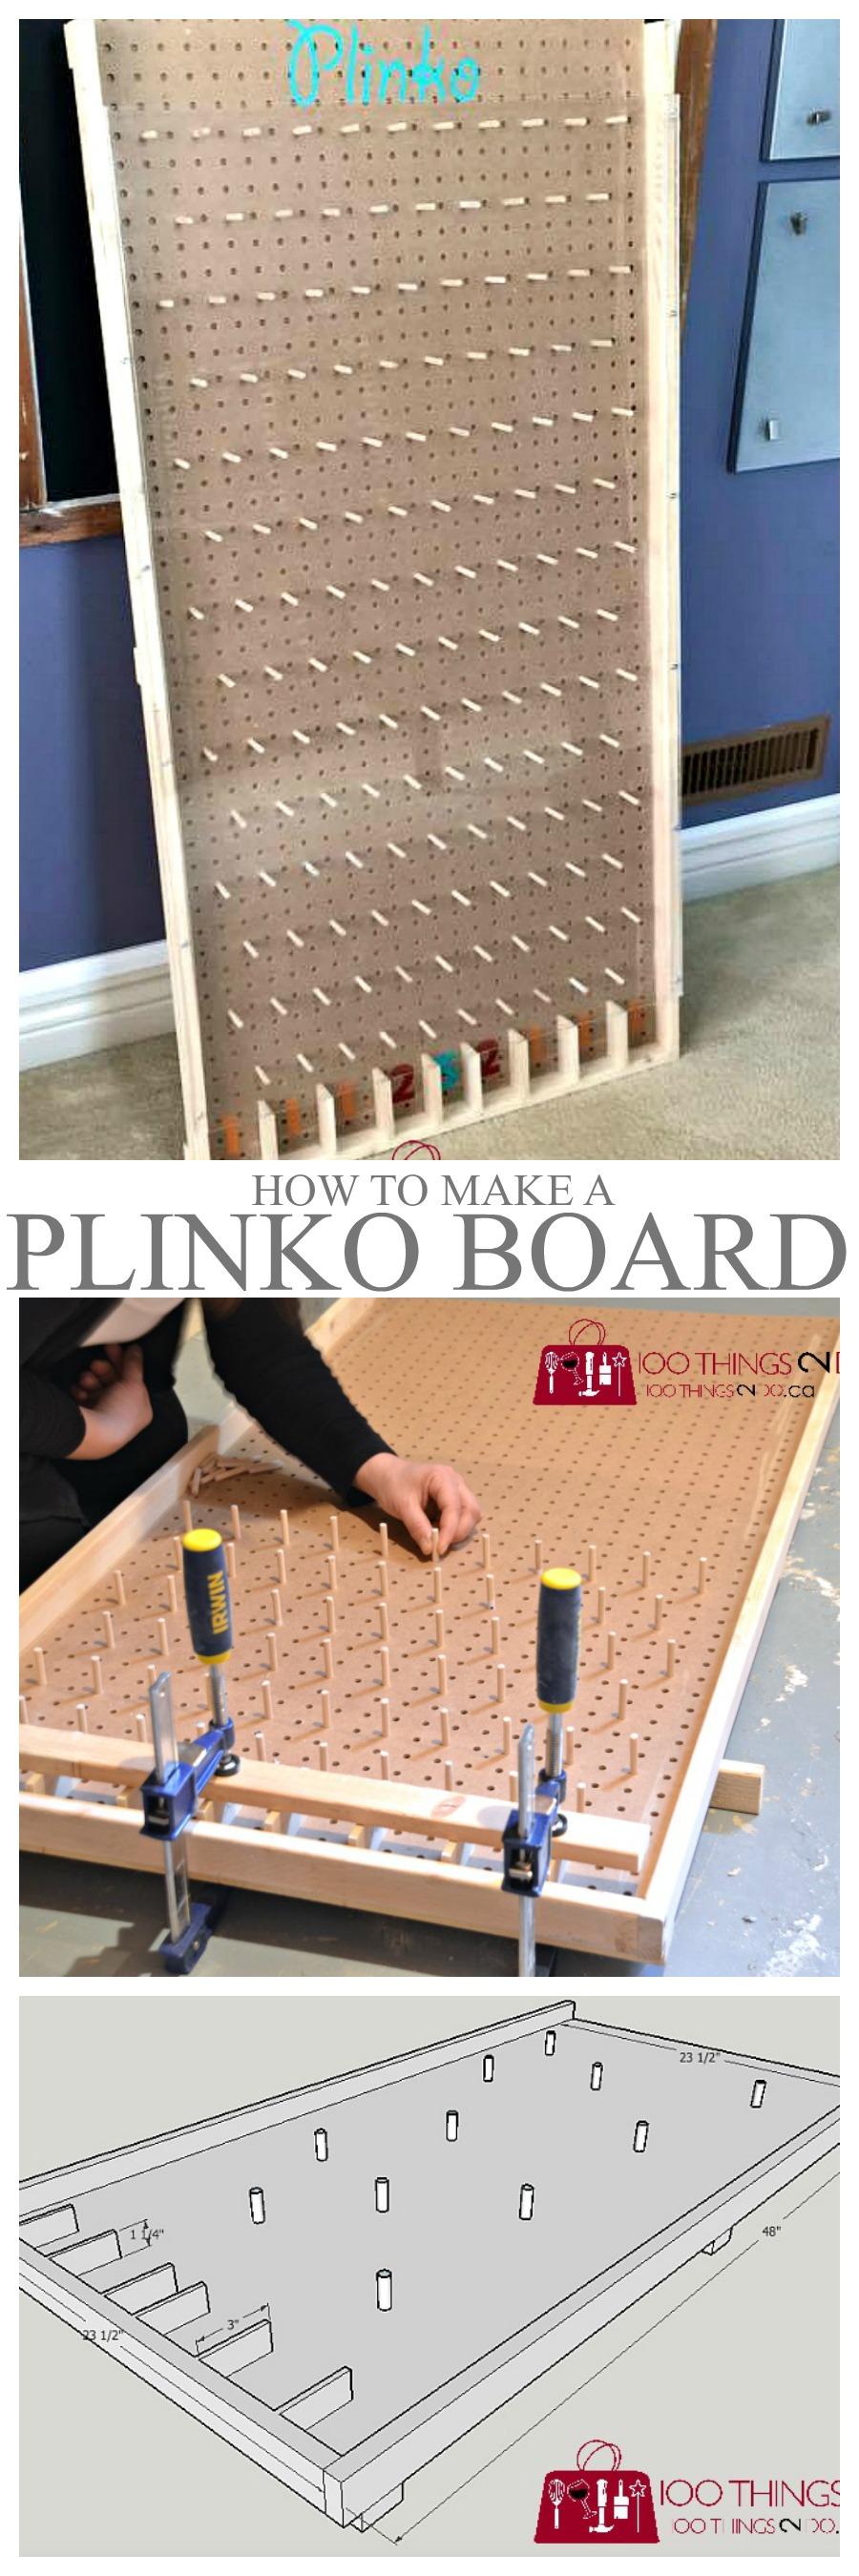 How to make a plinko board solutioingenieria Choice Image